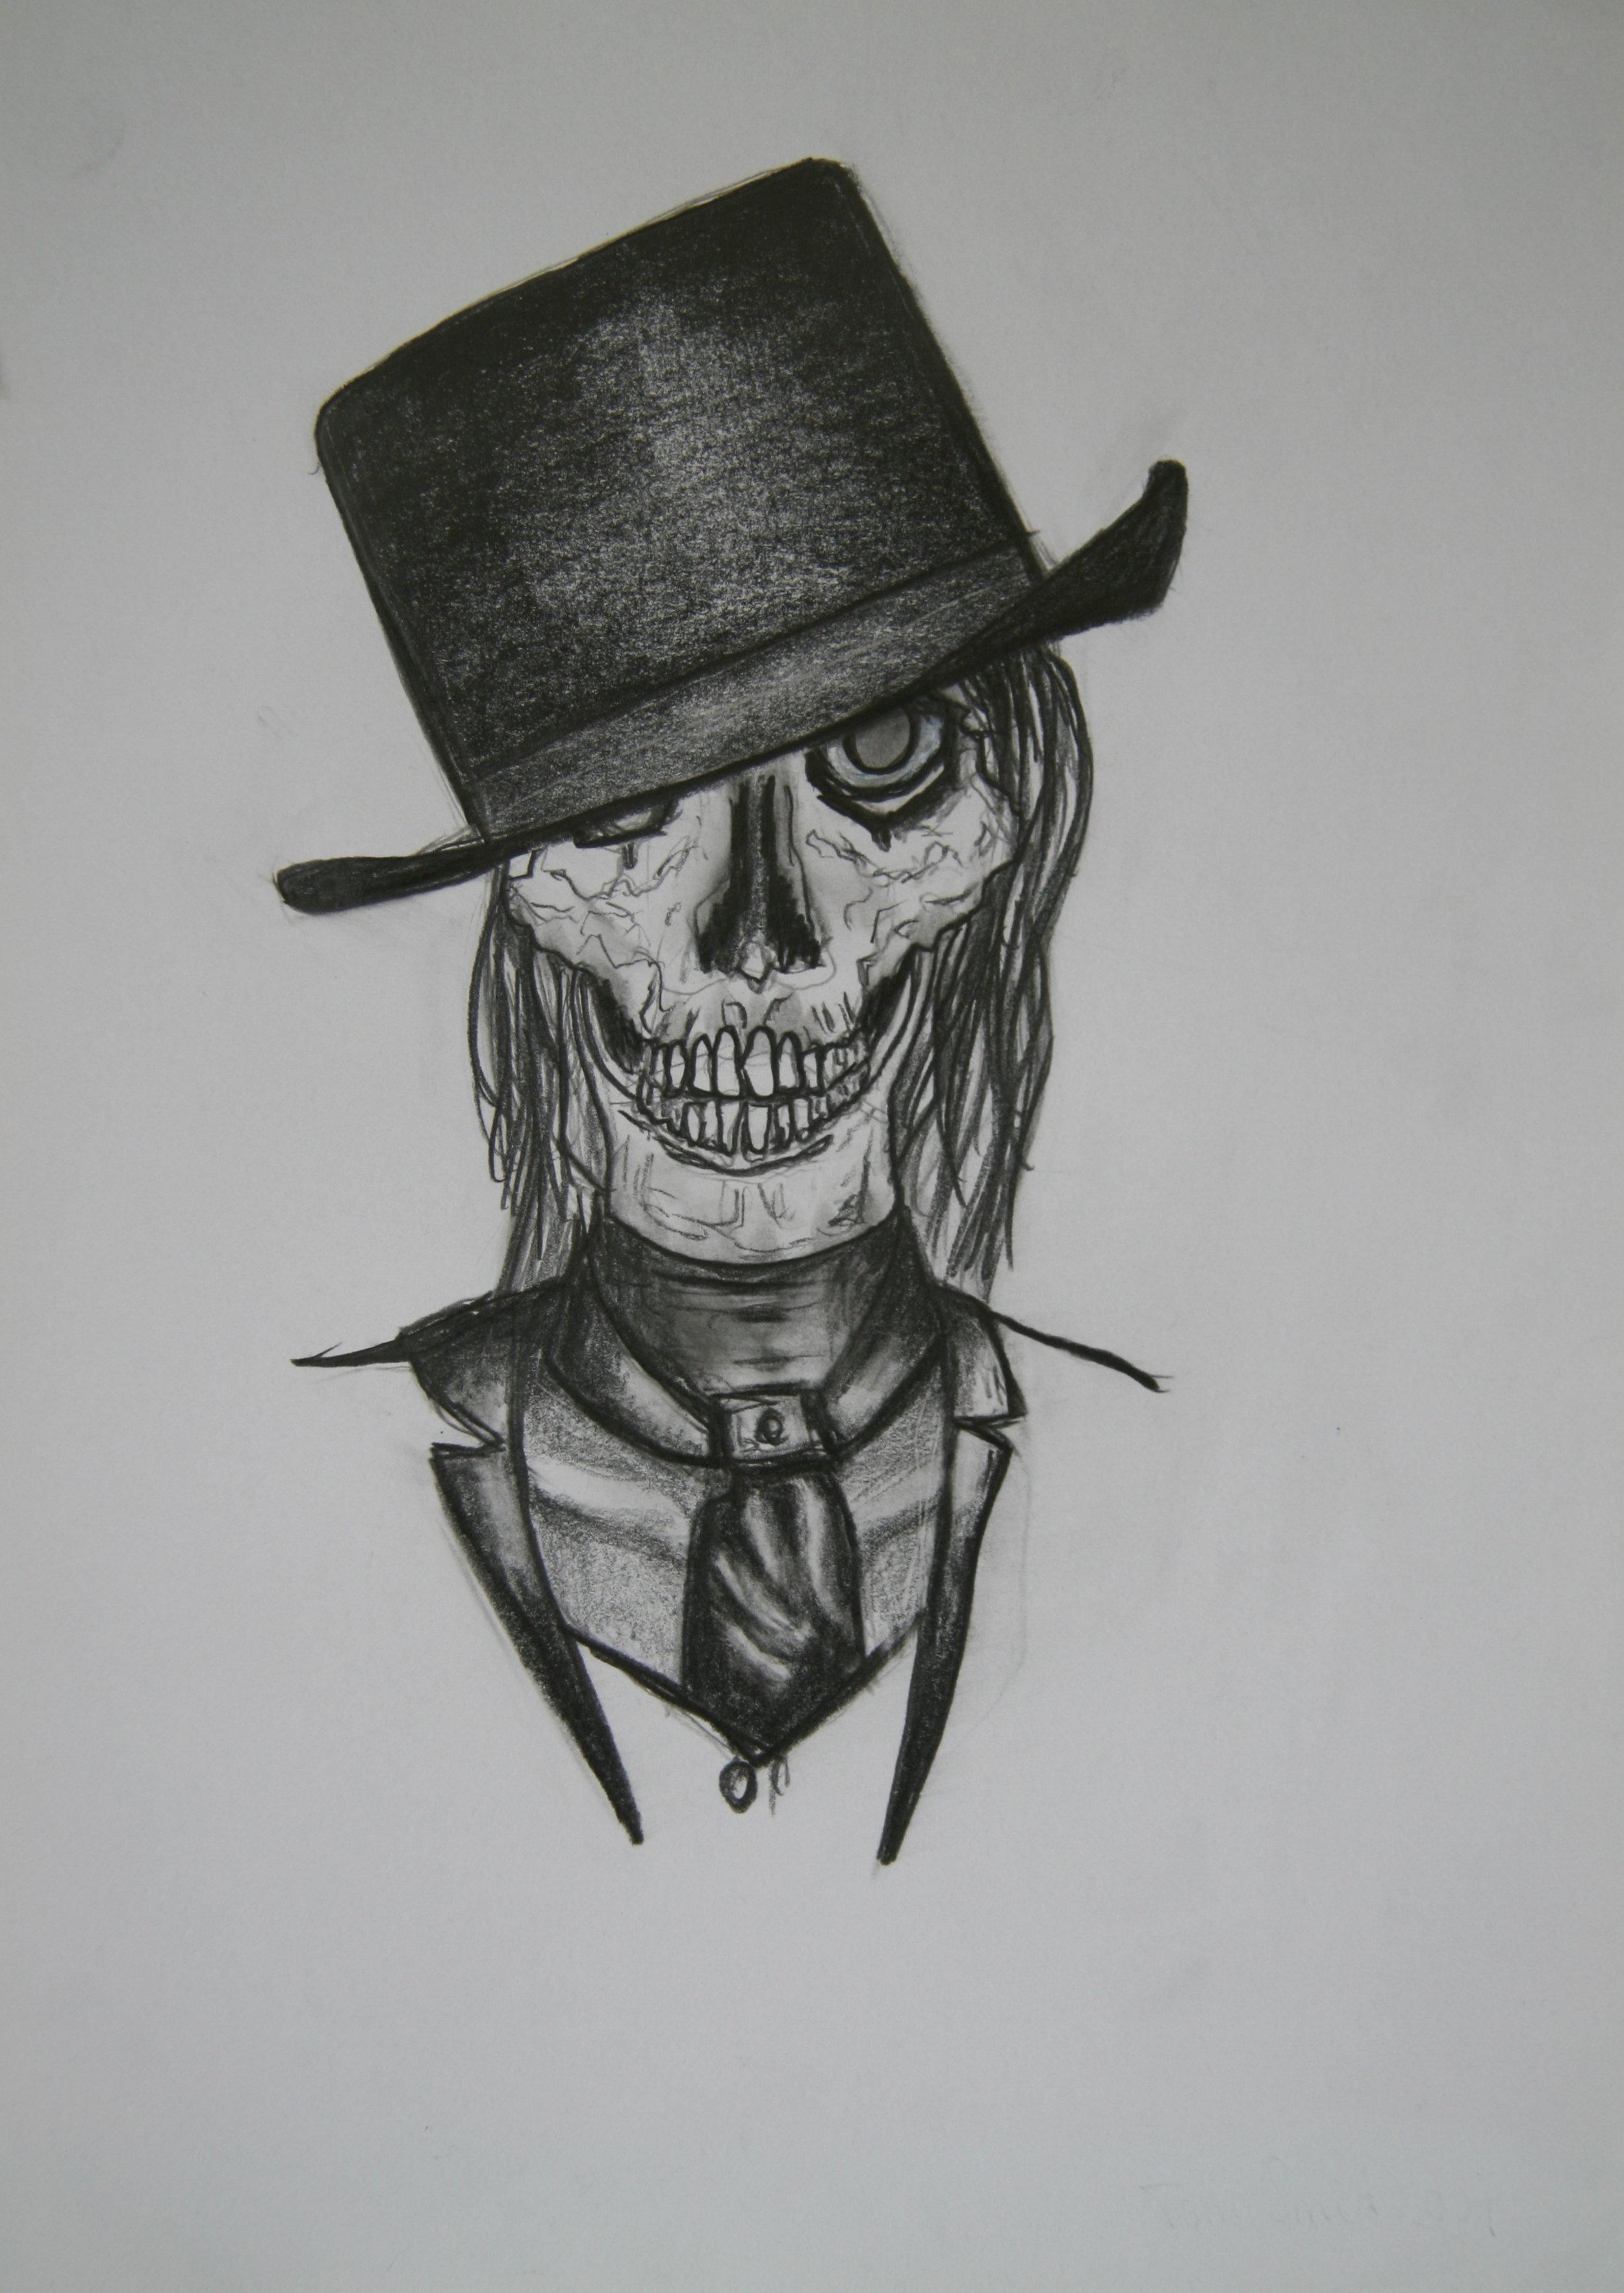 Skull 8, 30x21cm, pencil on paper